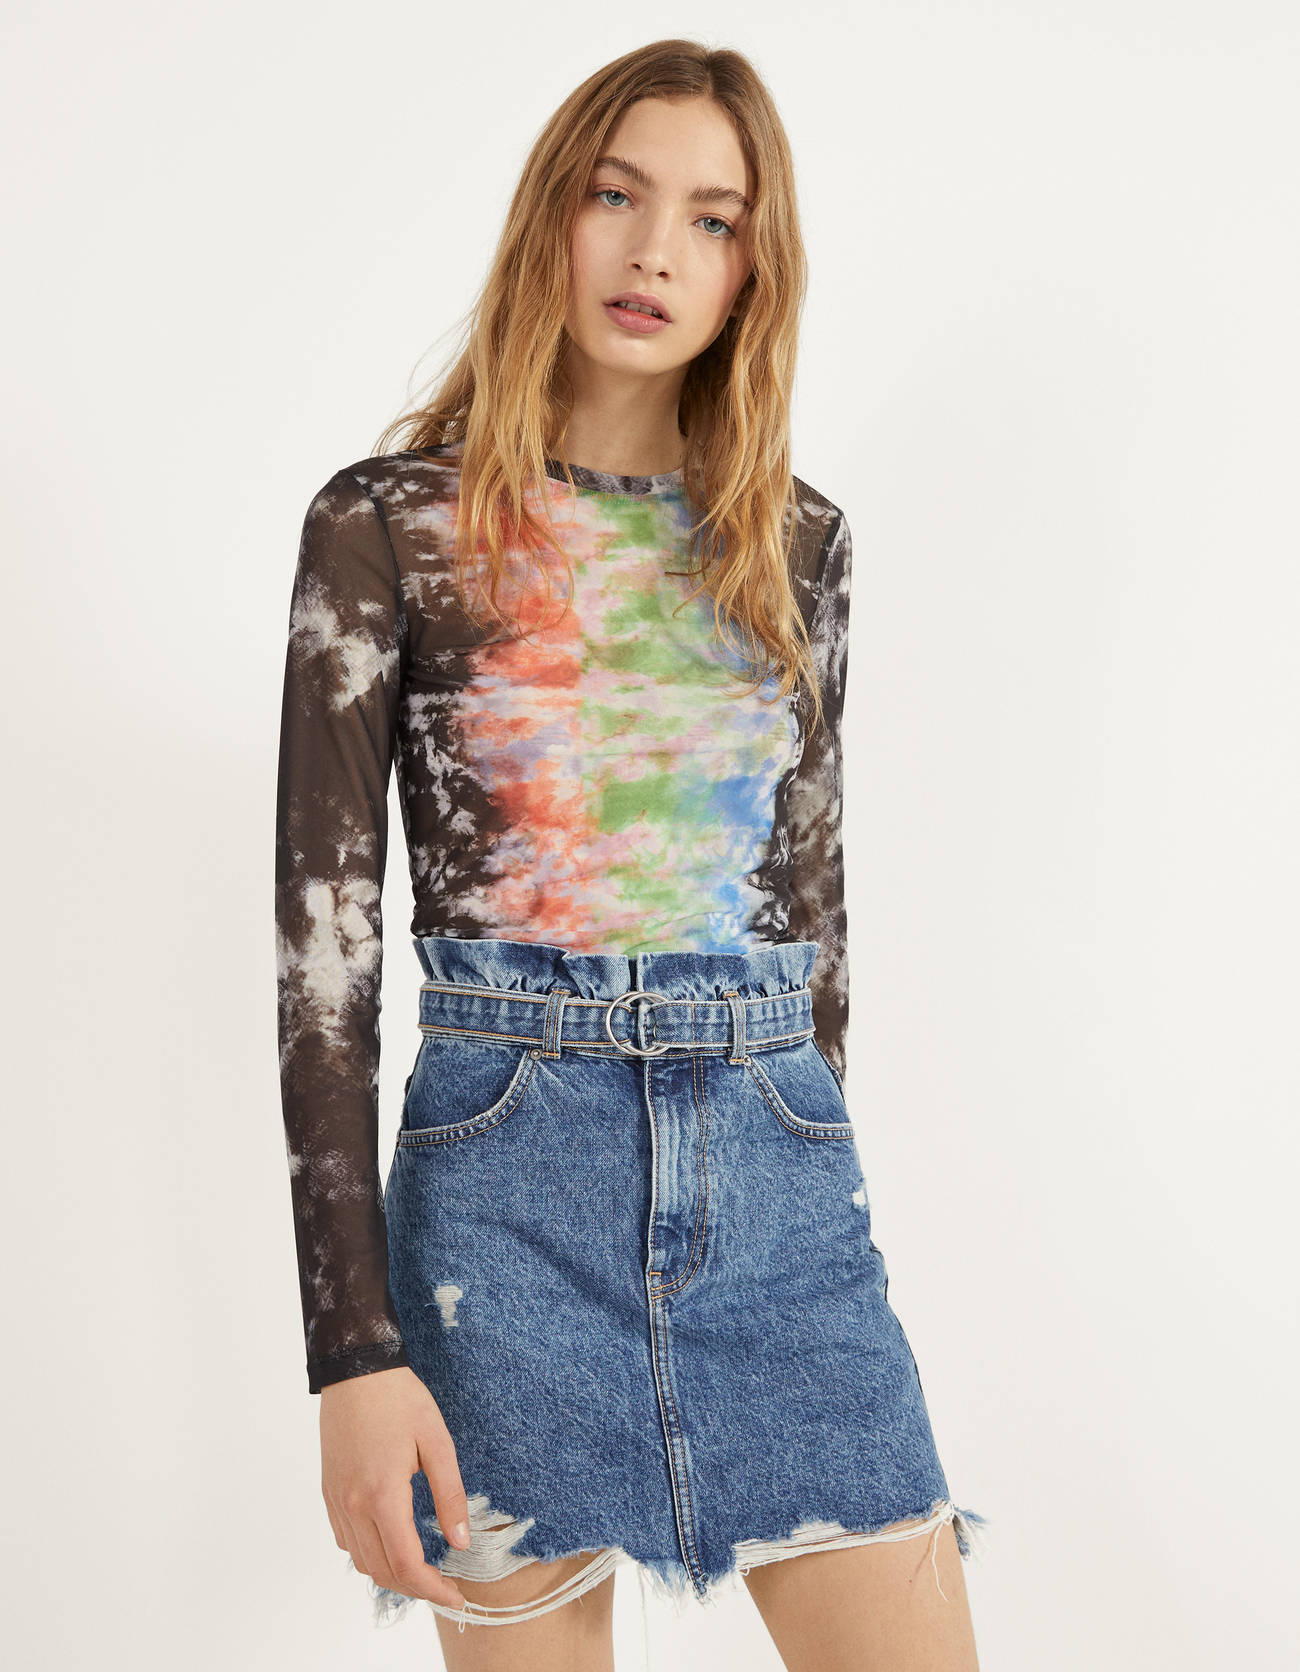 Camiseta tie-dye de tul